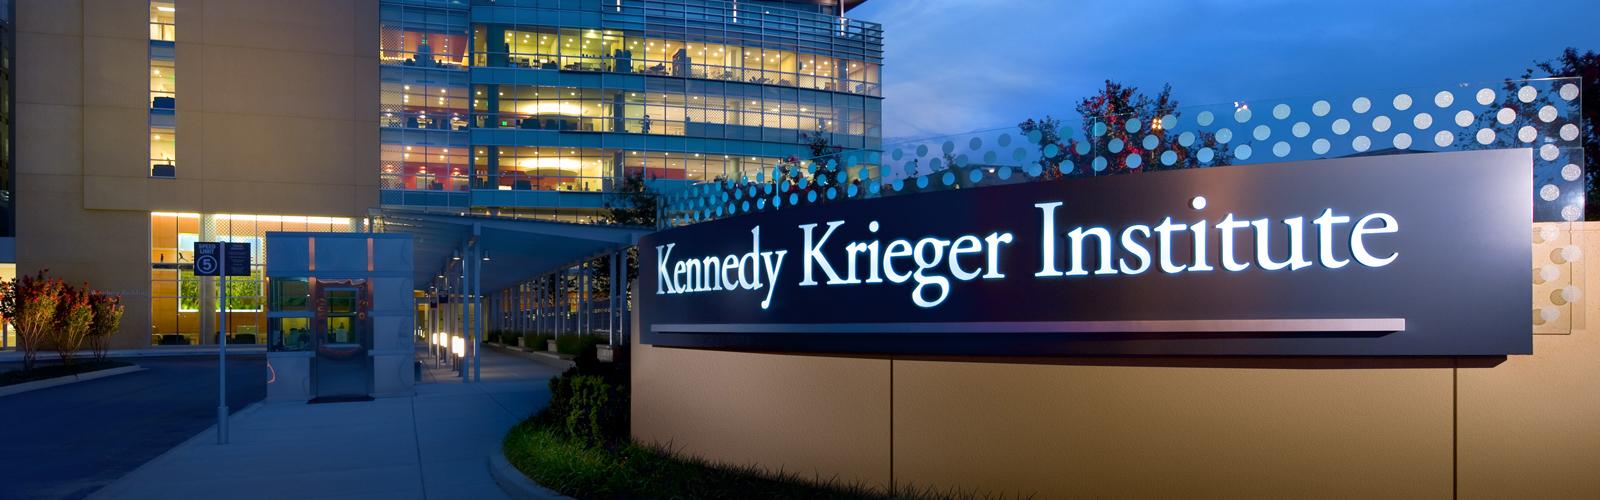 Epic CareLink | Kennedy Krieger Institute